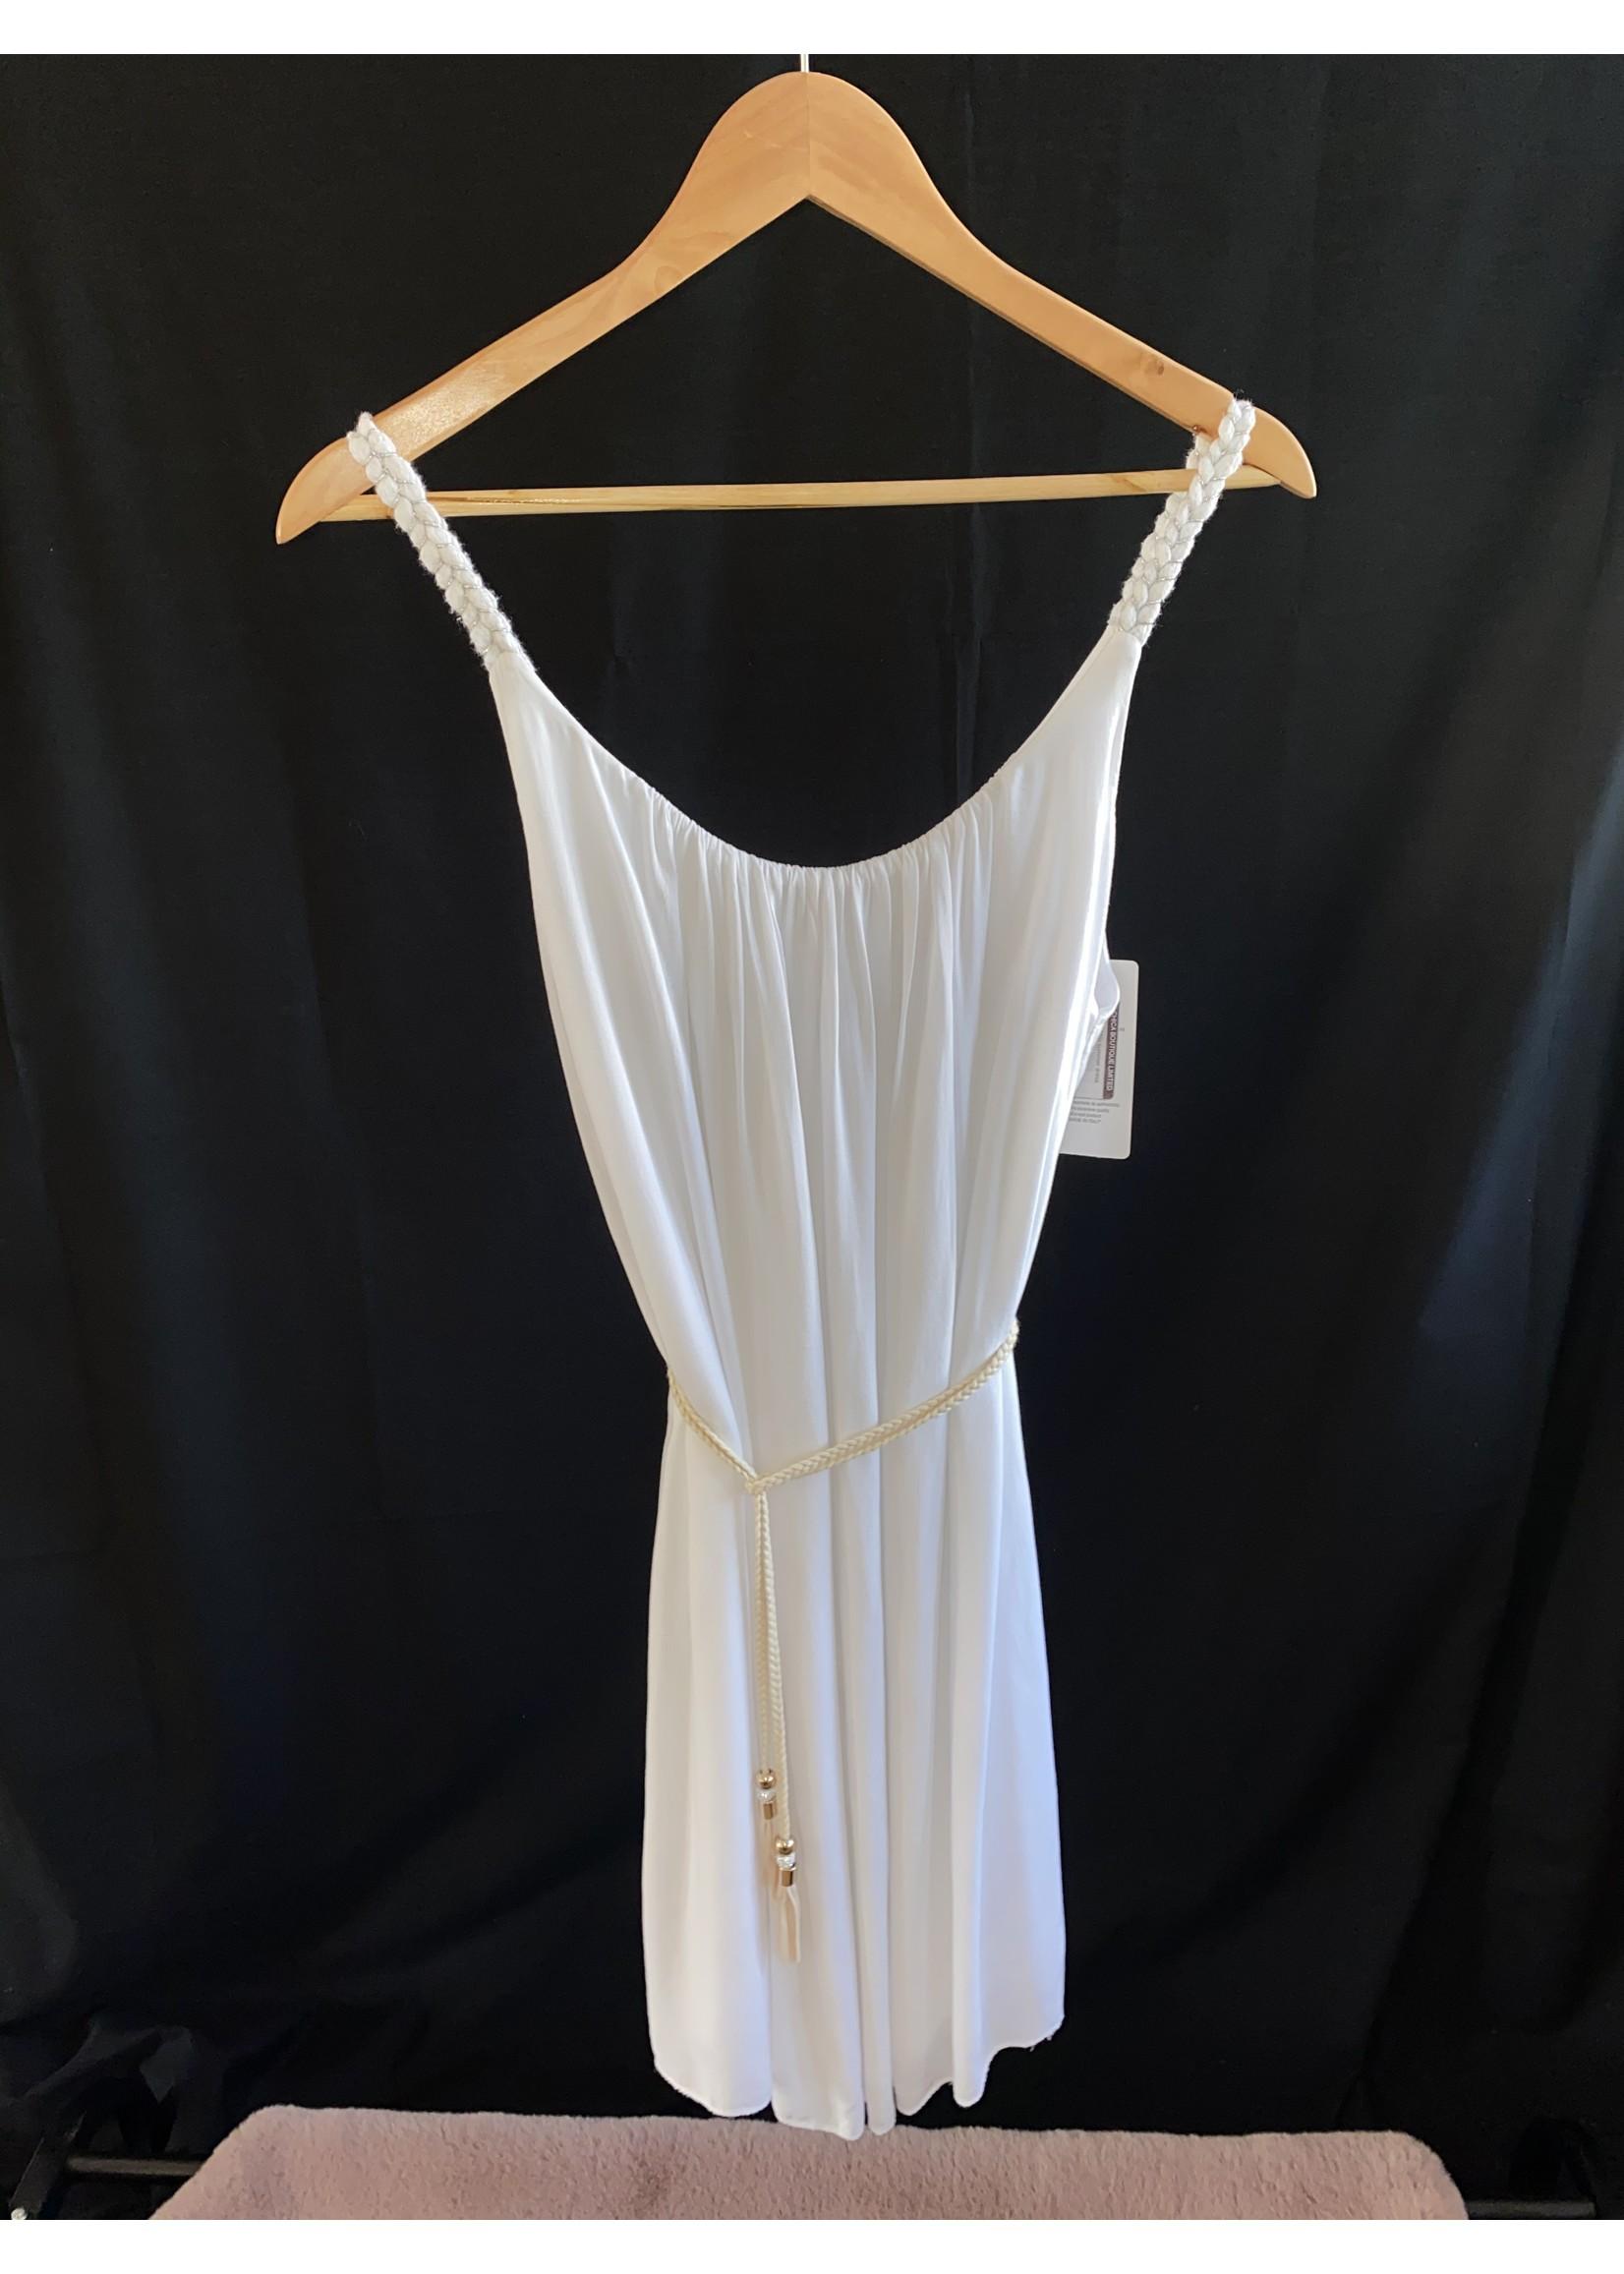 Milo summer dress